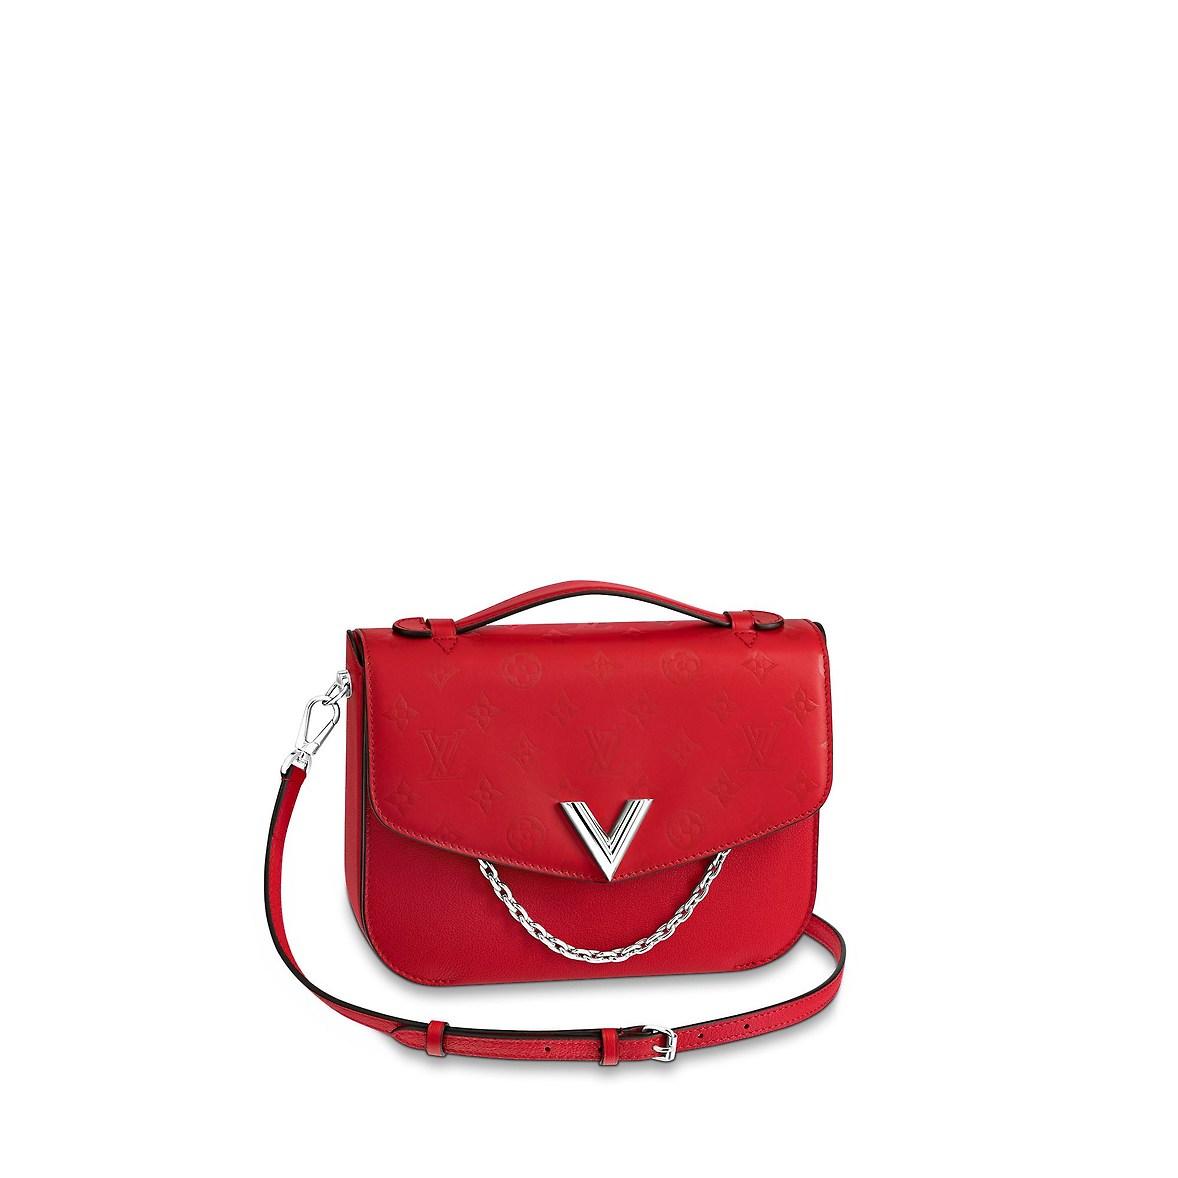 Borsa a tracolla rossa Louis Vuitton inverno 2019